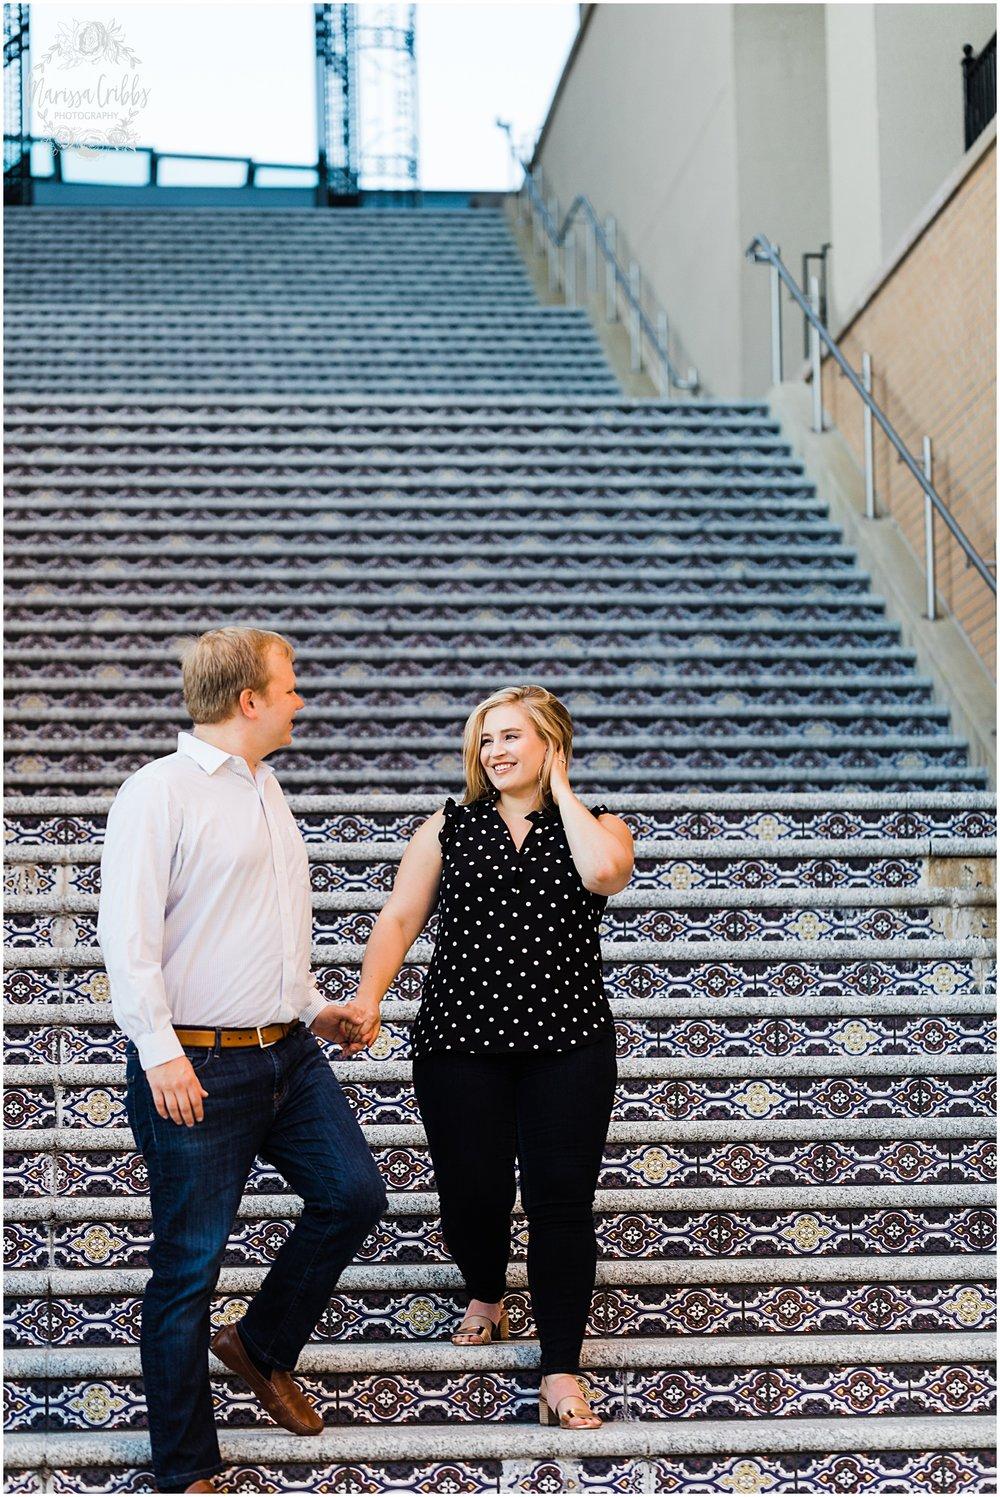 Scott & Rachel Engagement | Hi Hat Coffee and Plaza | Marissa Cribbs Photography_6240.jpg